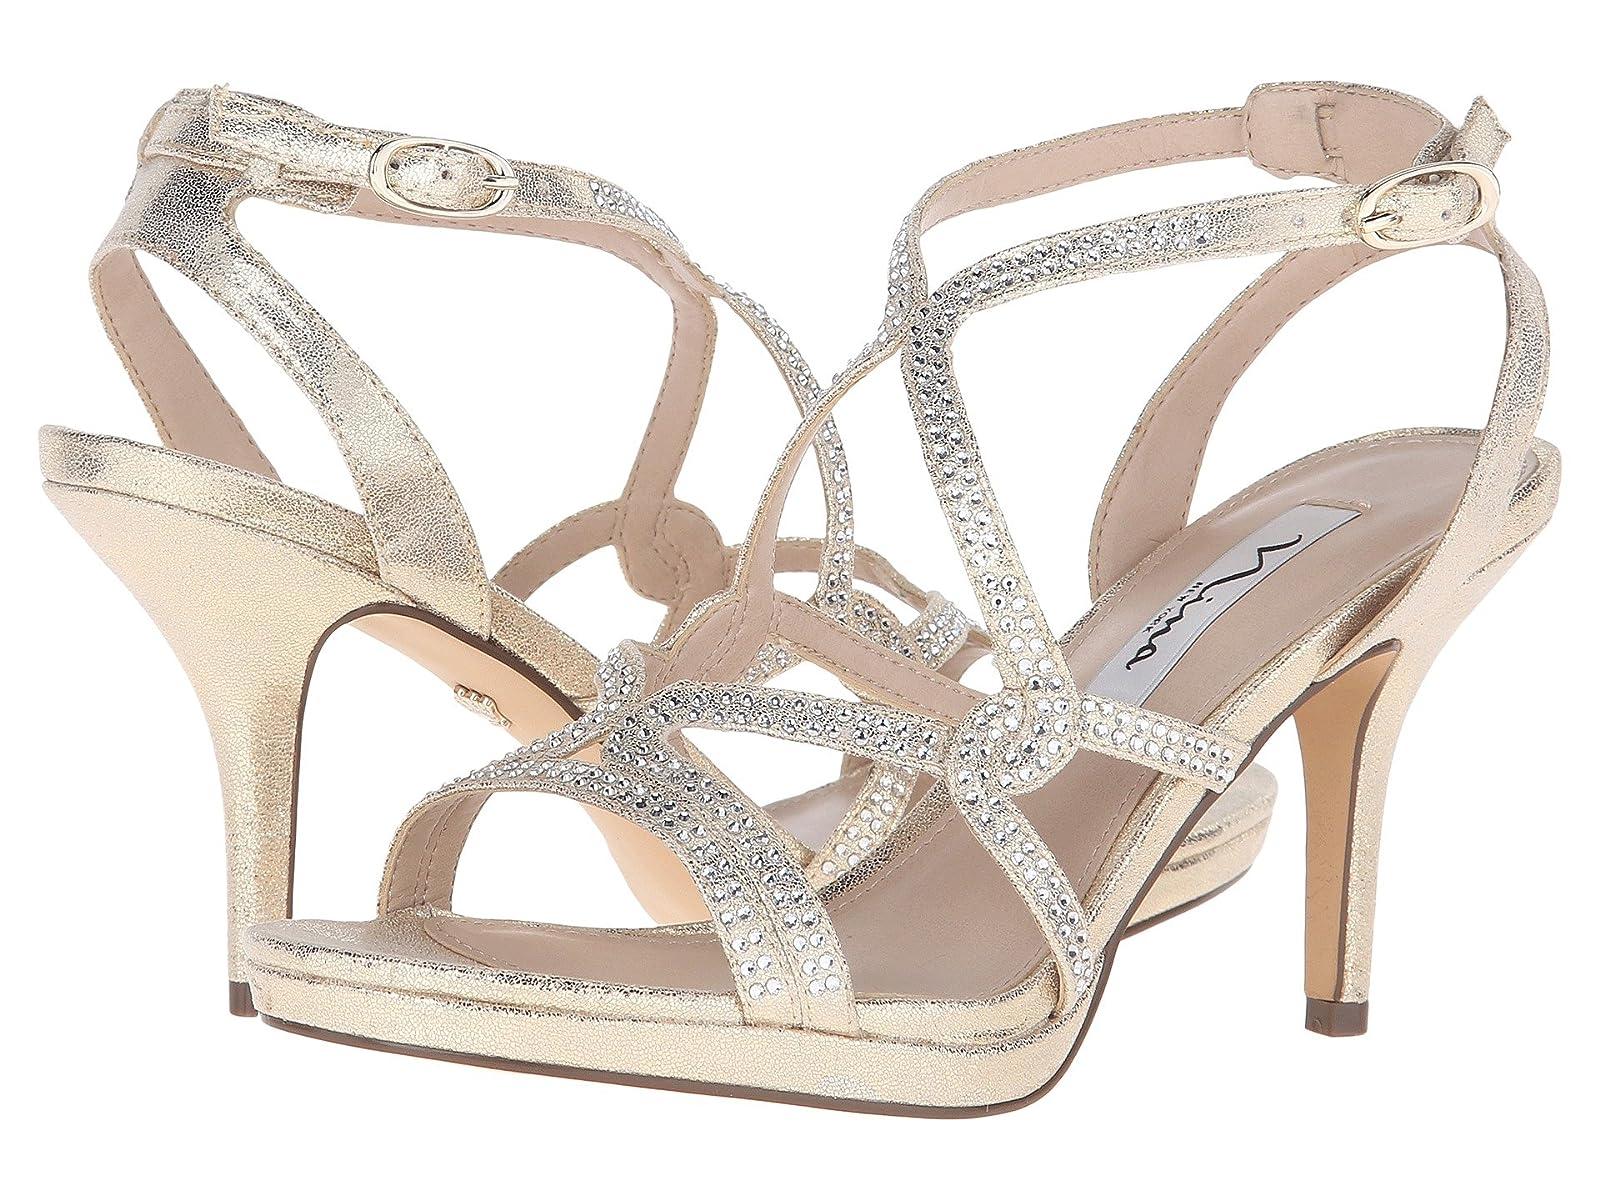 Nina VarshaCheap and distinctive eye-catching shoes